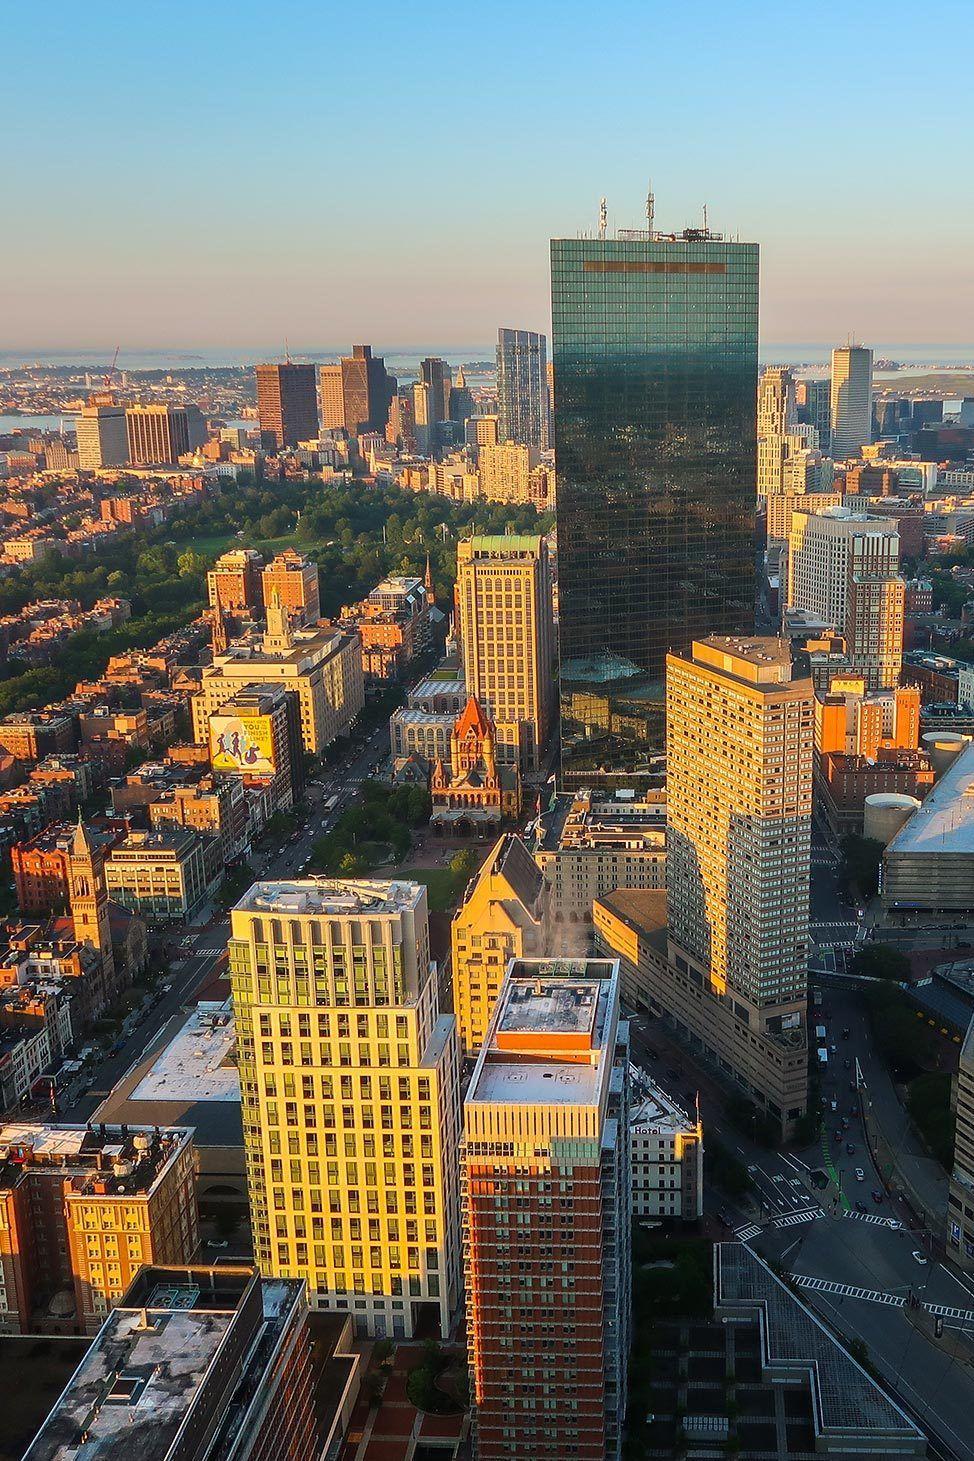 View from Skywalk Boston